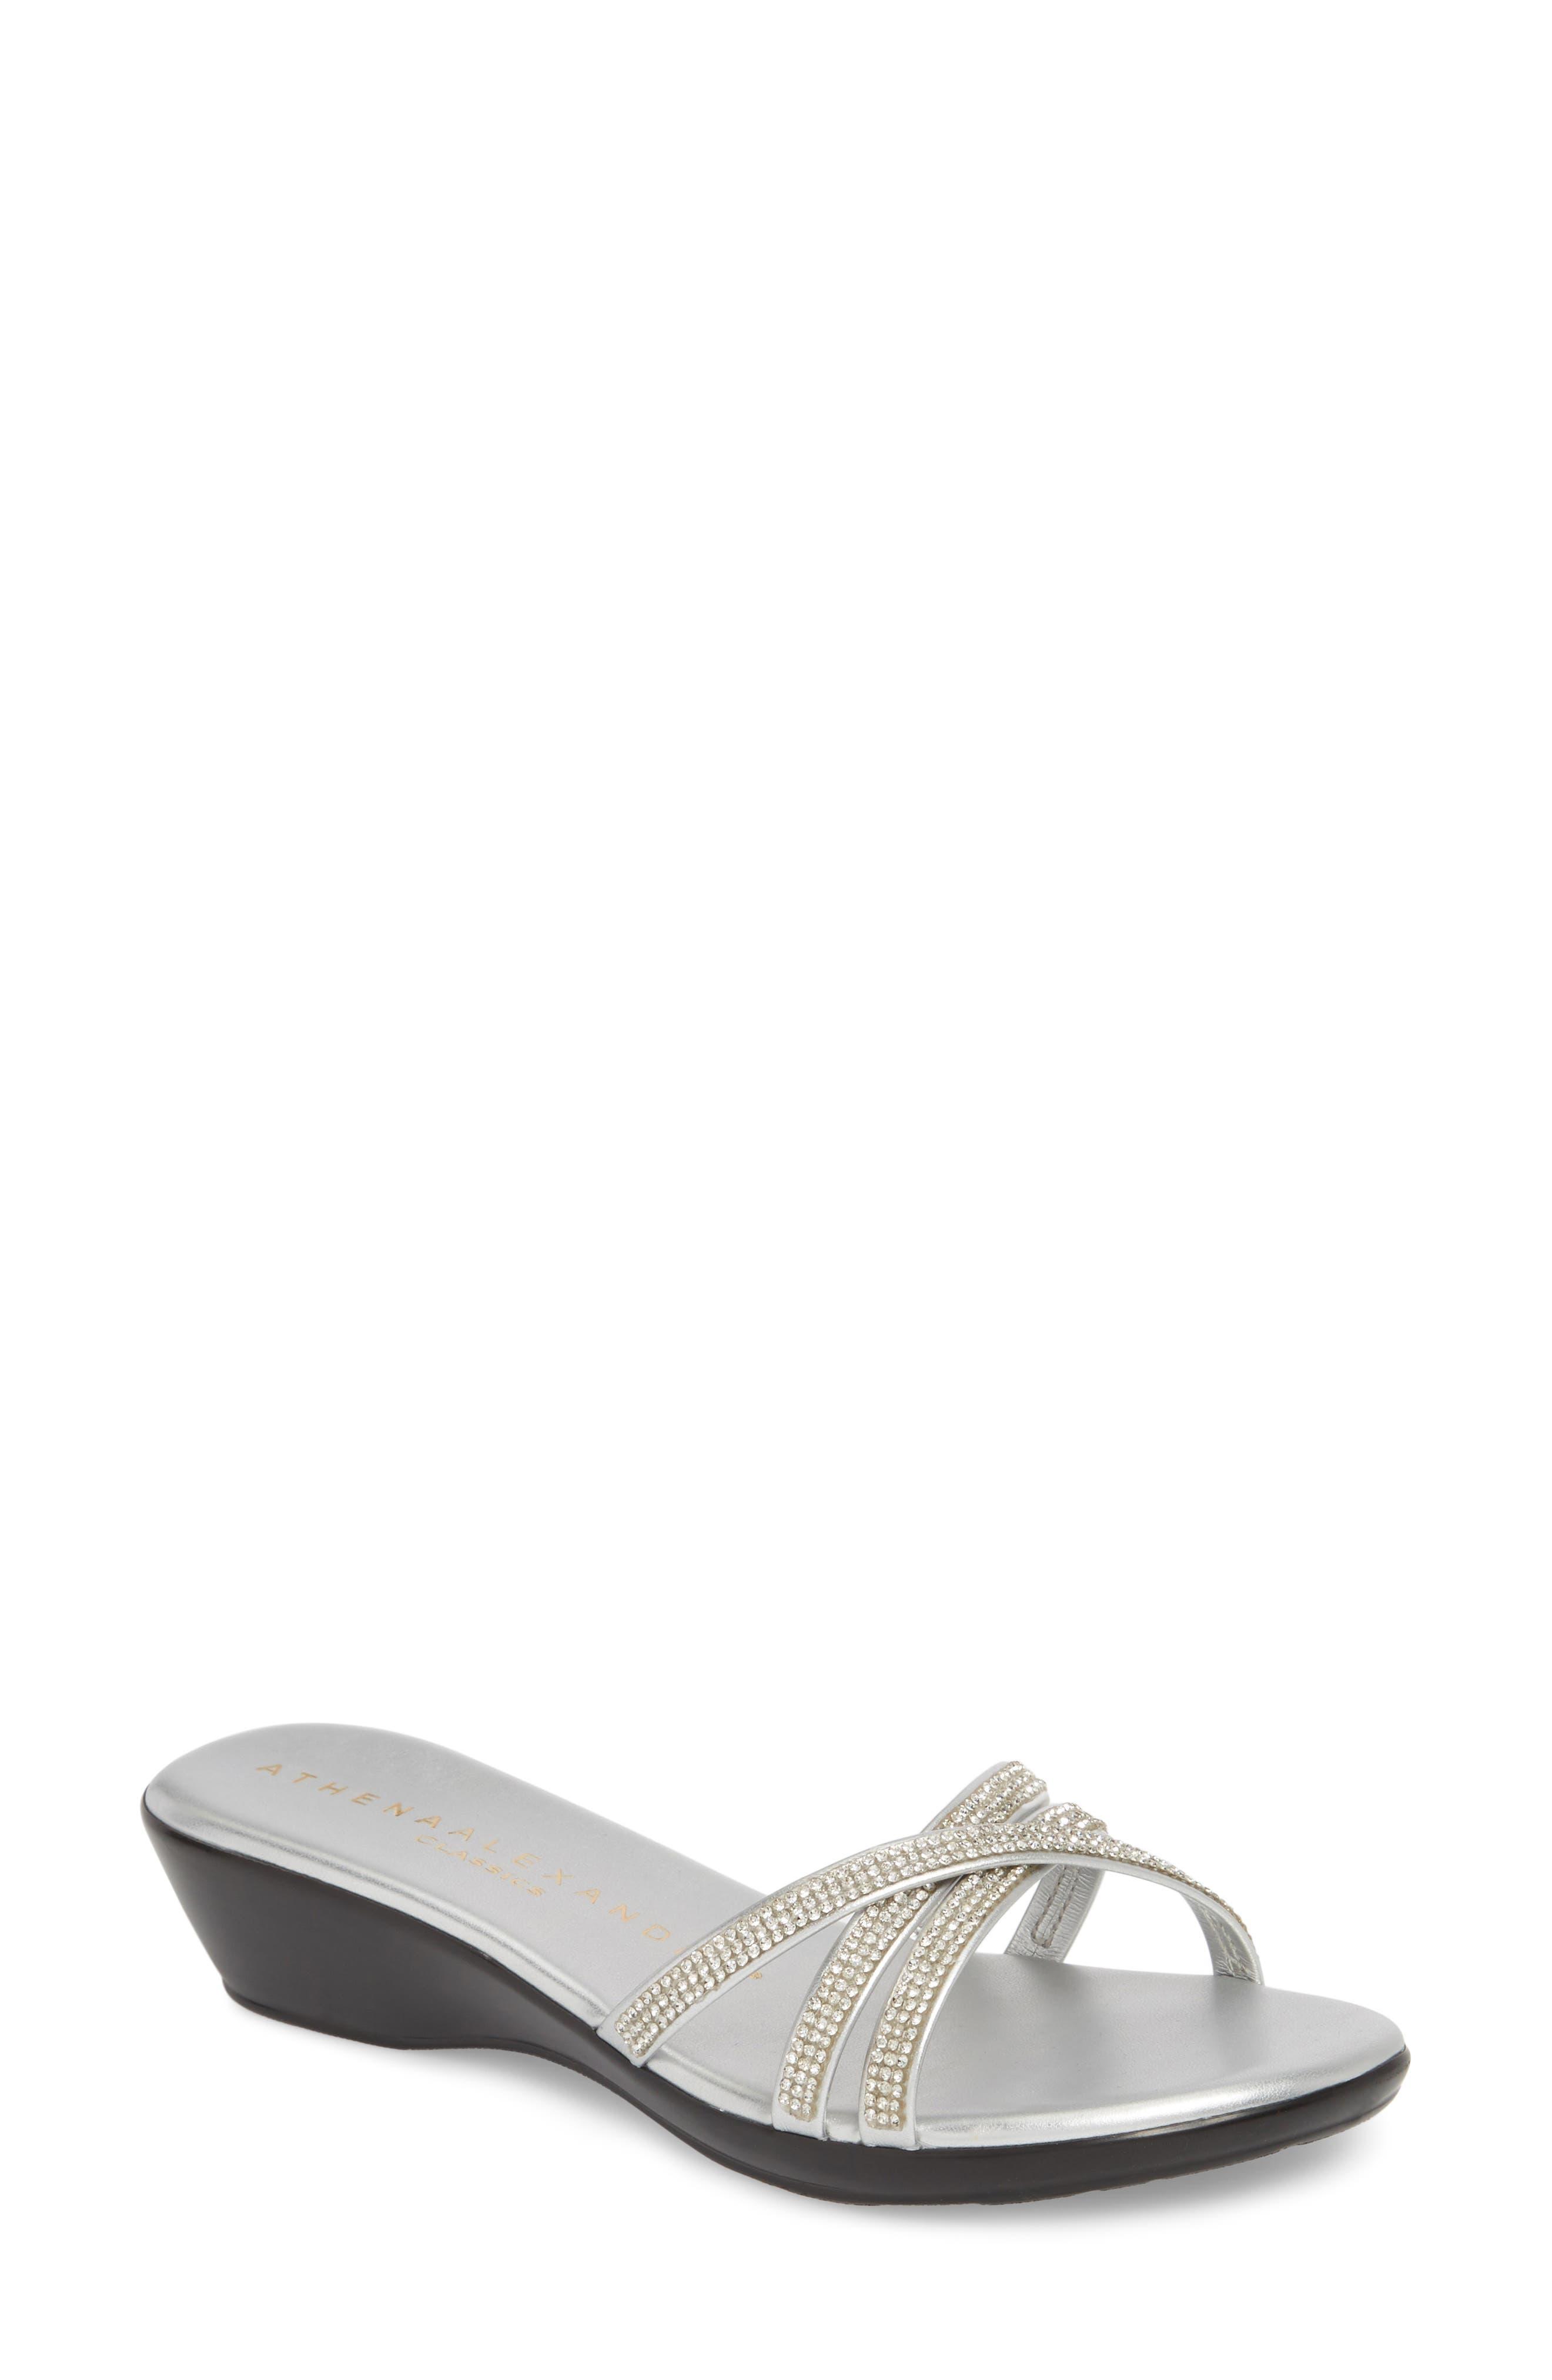 Harlow Slide Sandal,                         Main,                         color, SILVER FABRIC